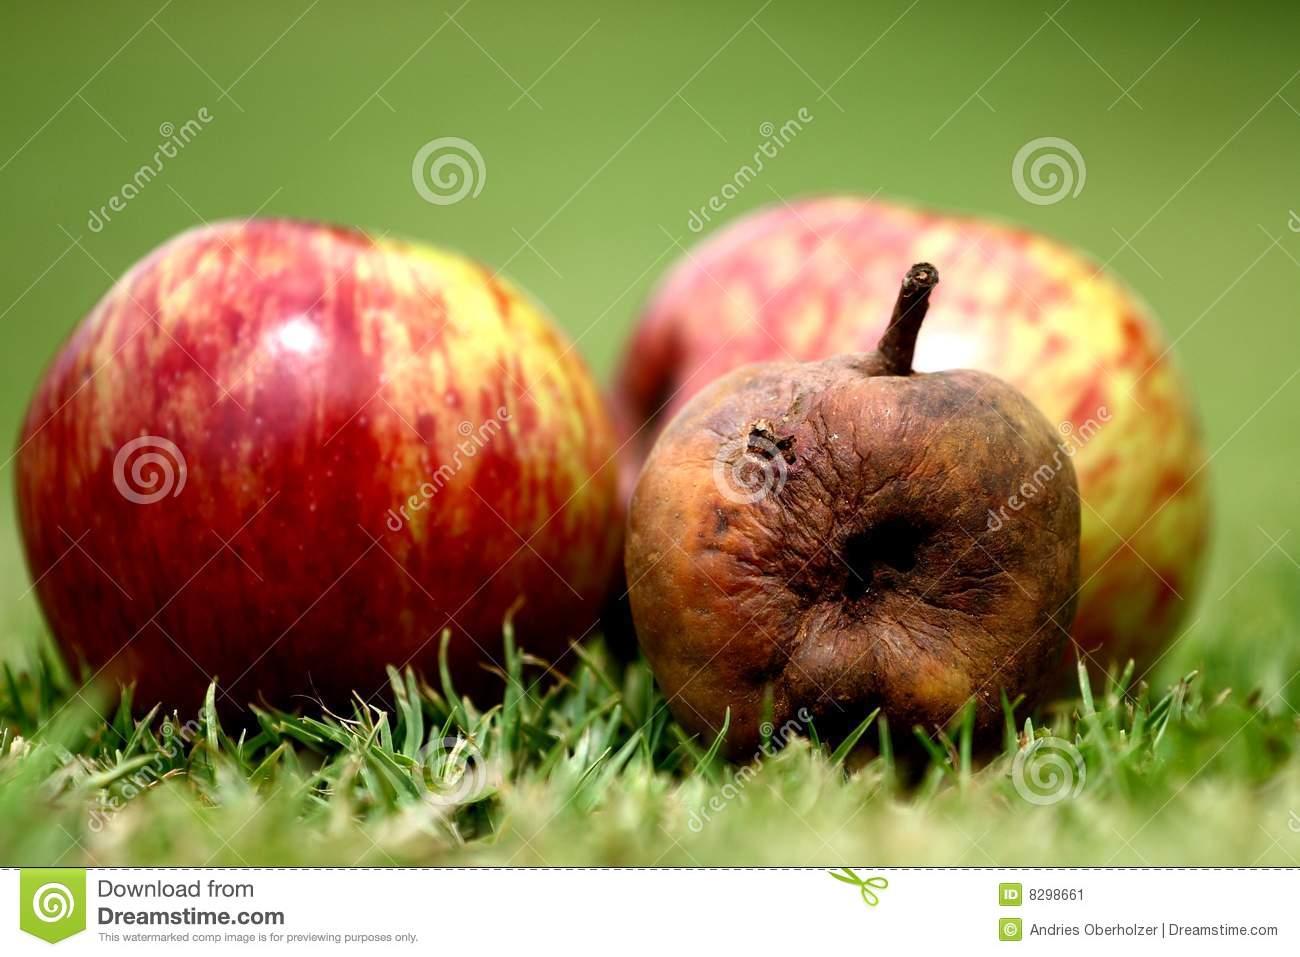 Spoil apple clipart.